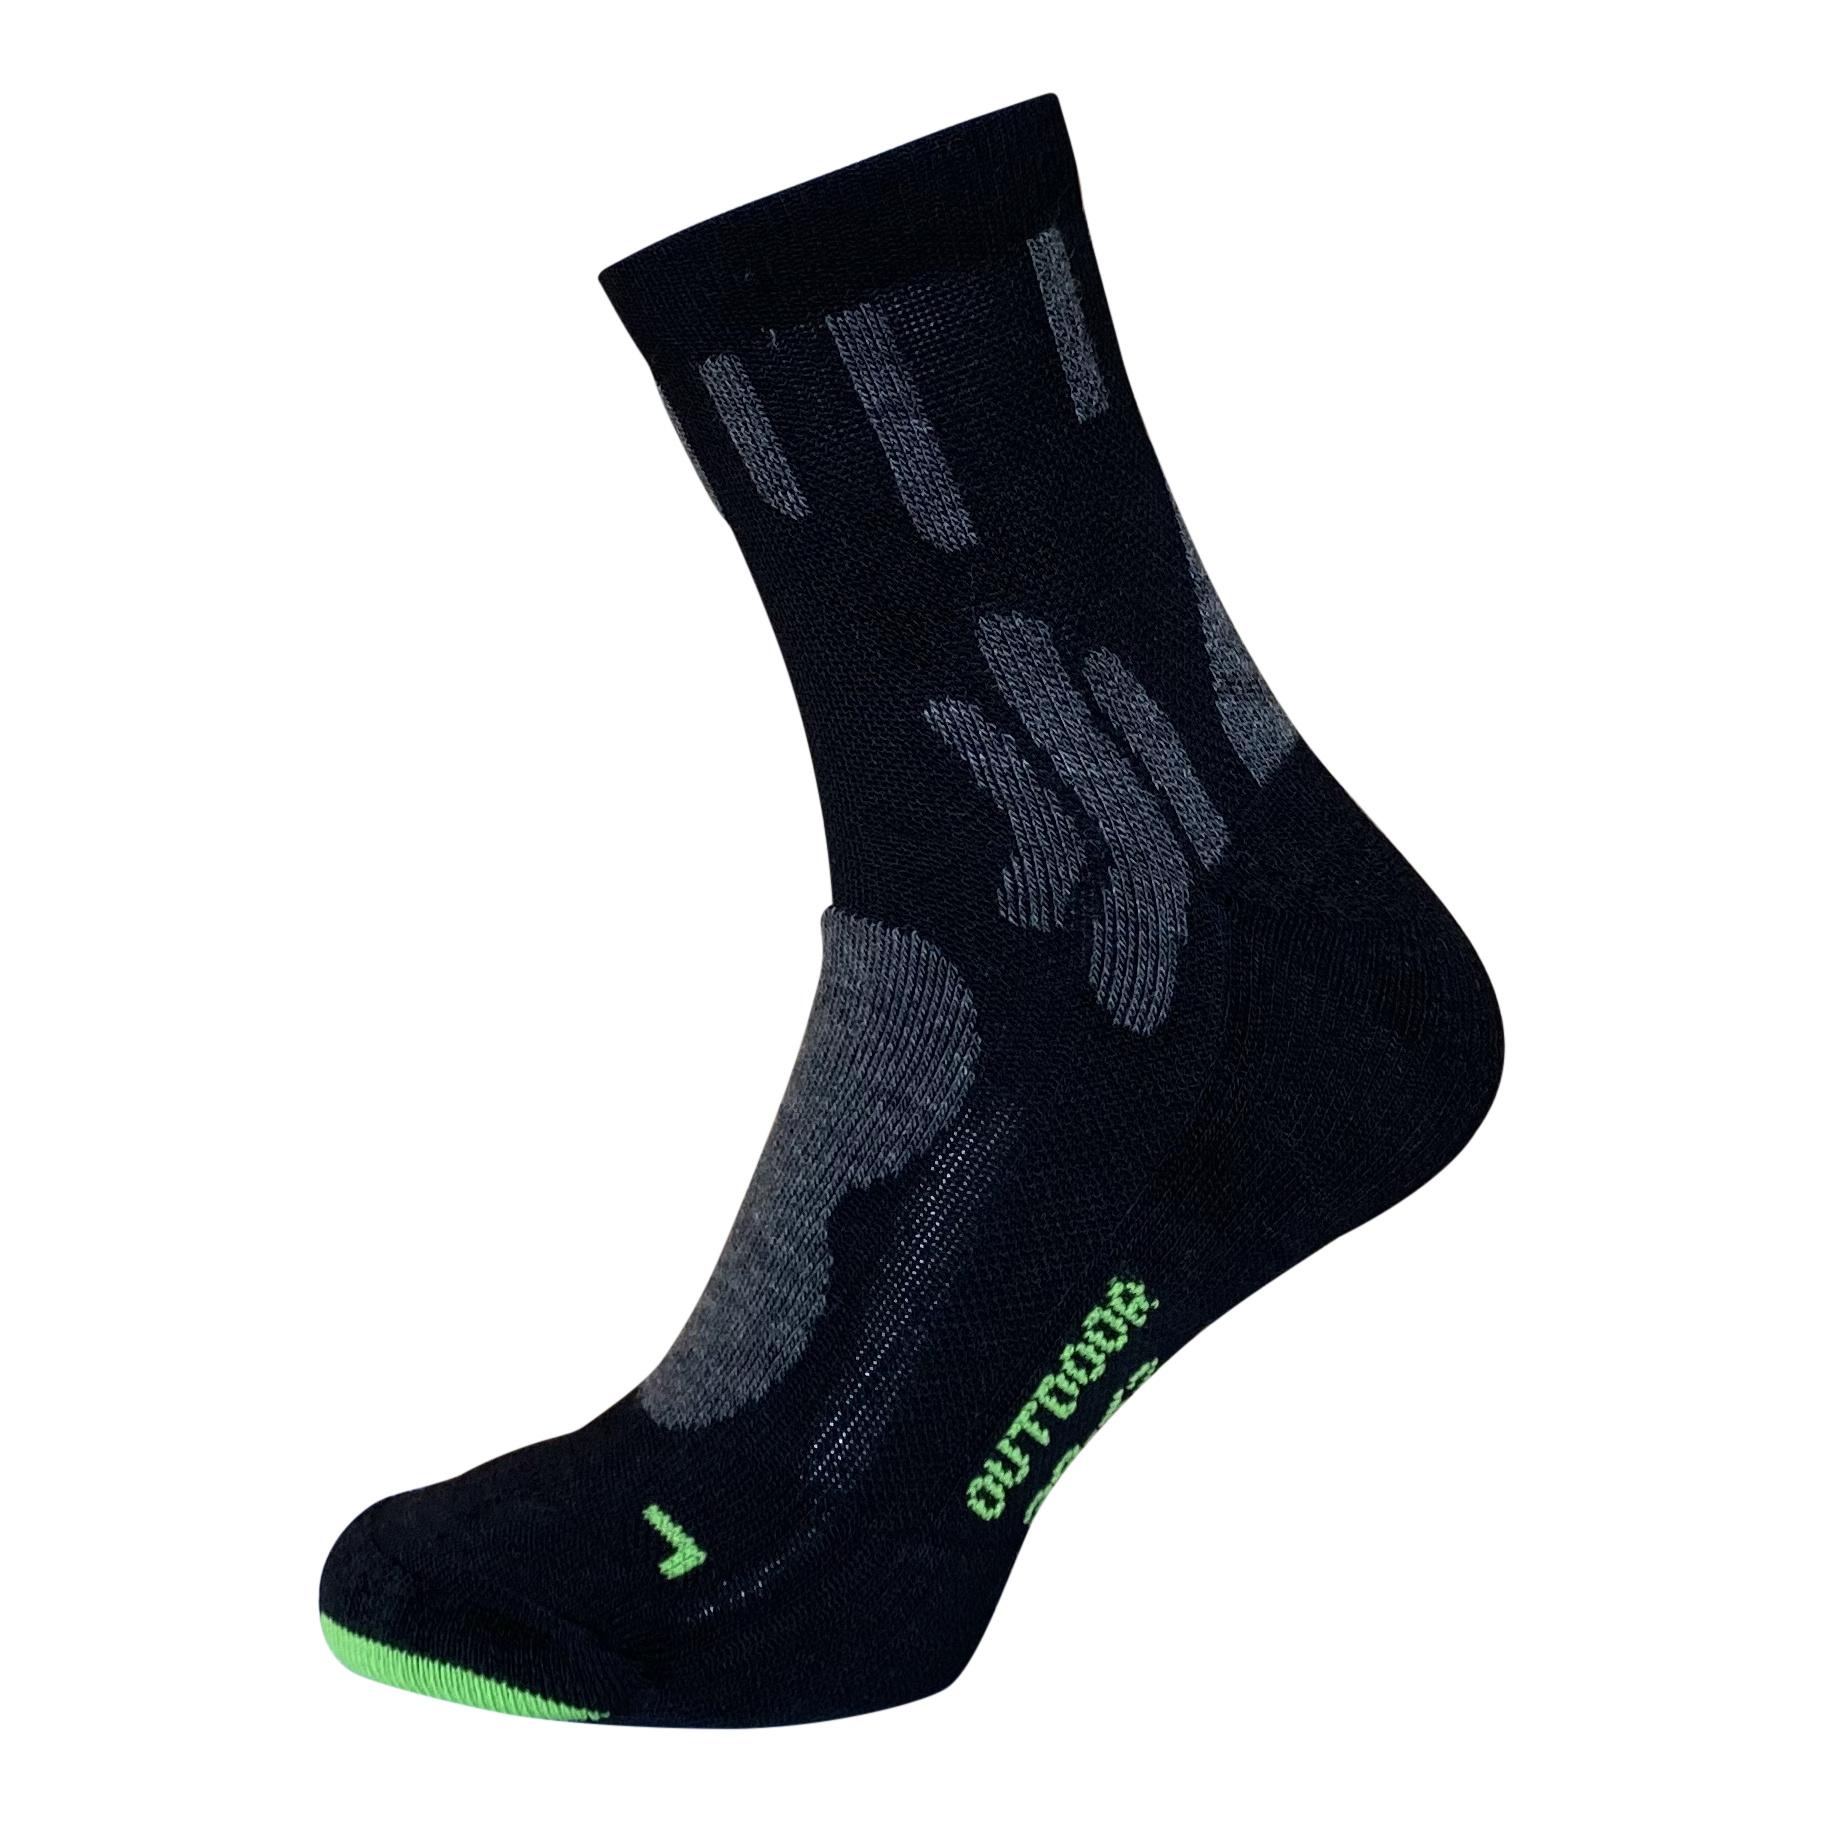 BORU Boru Bamboo Outdoor sokken - zwart